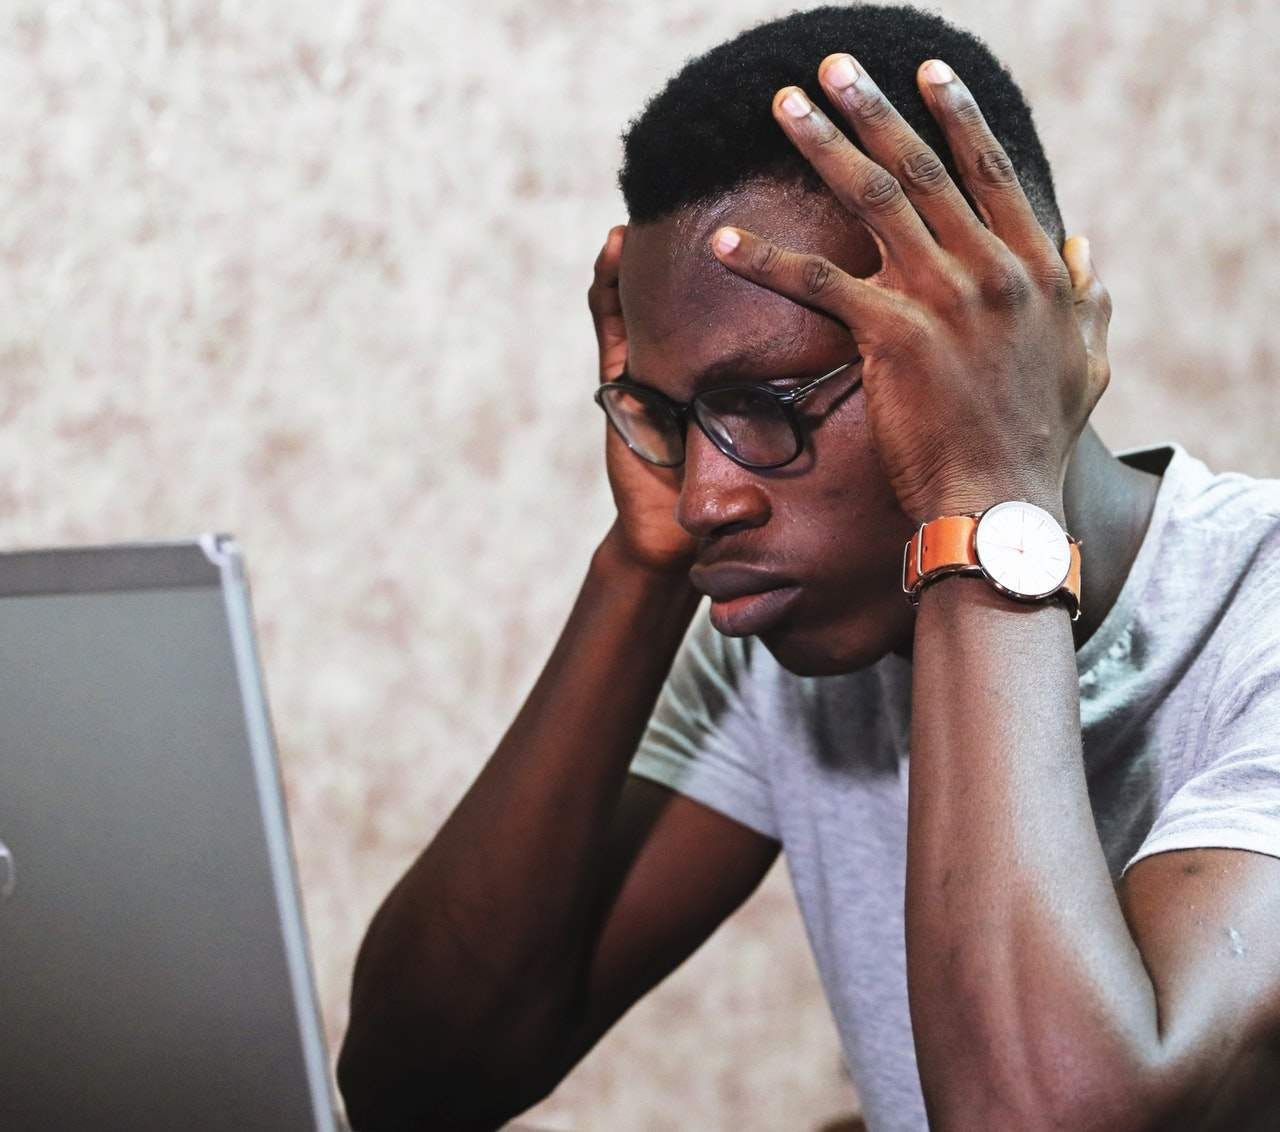 Tο «burnout» δεν σχετίζεται με το πόσες ώρες εργάζεται κάποιος, αλλά με το πόσο ικανοποιημένος είναι από την εργασία του και με το πως είναι οργανωμένος ο εργασιακός του χώρος.